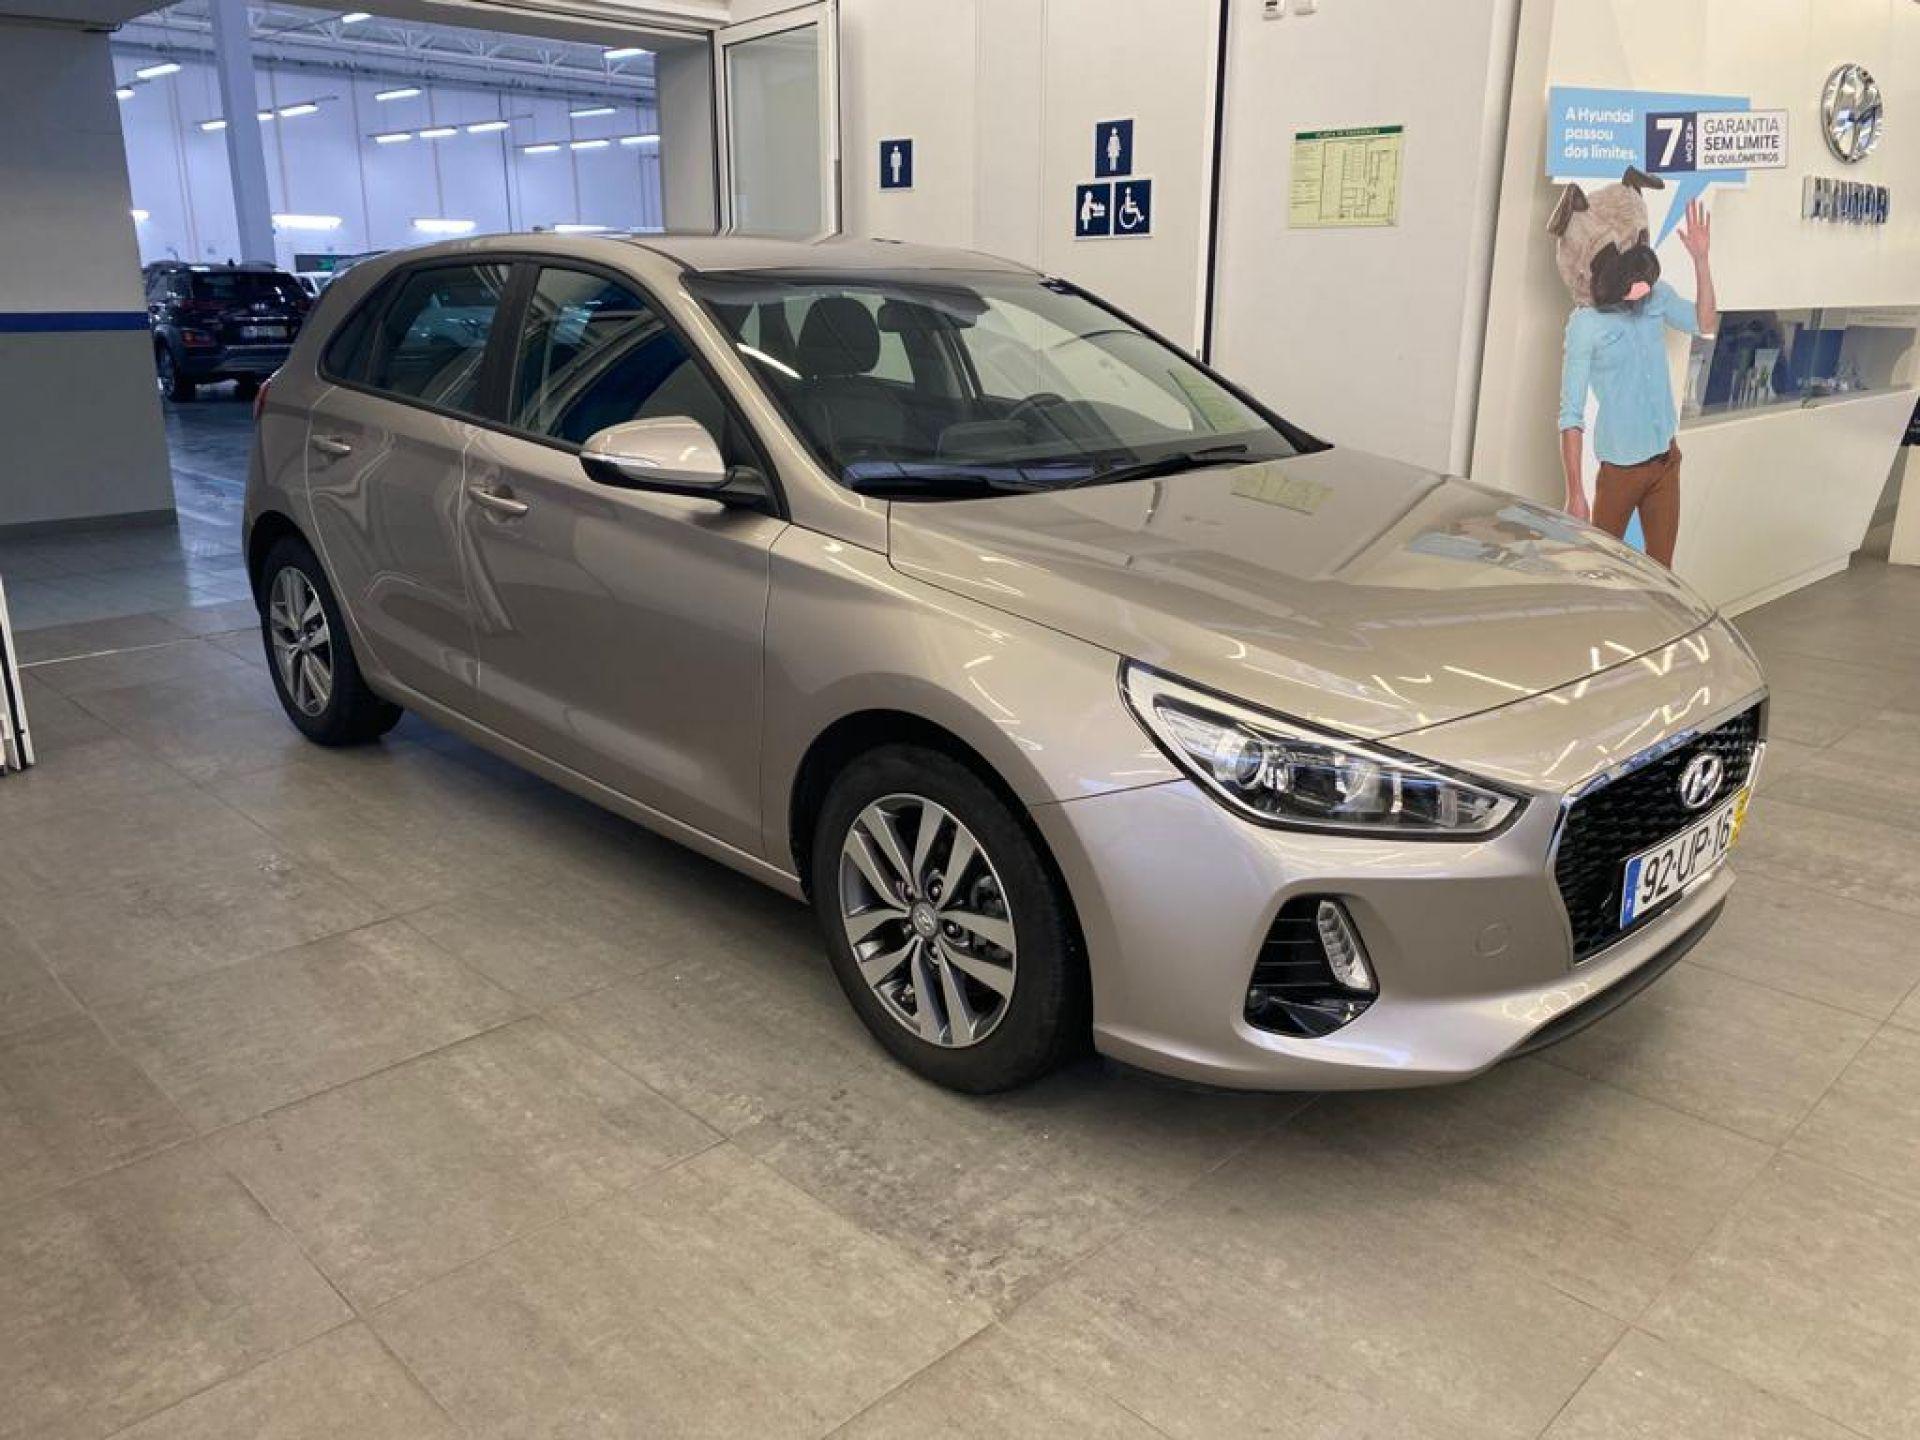 Hyundai i30 5P 1.6 CRDi COMFORT + NAVI 110CV segunda mão Setúbal